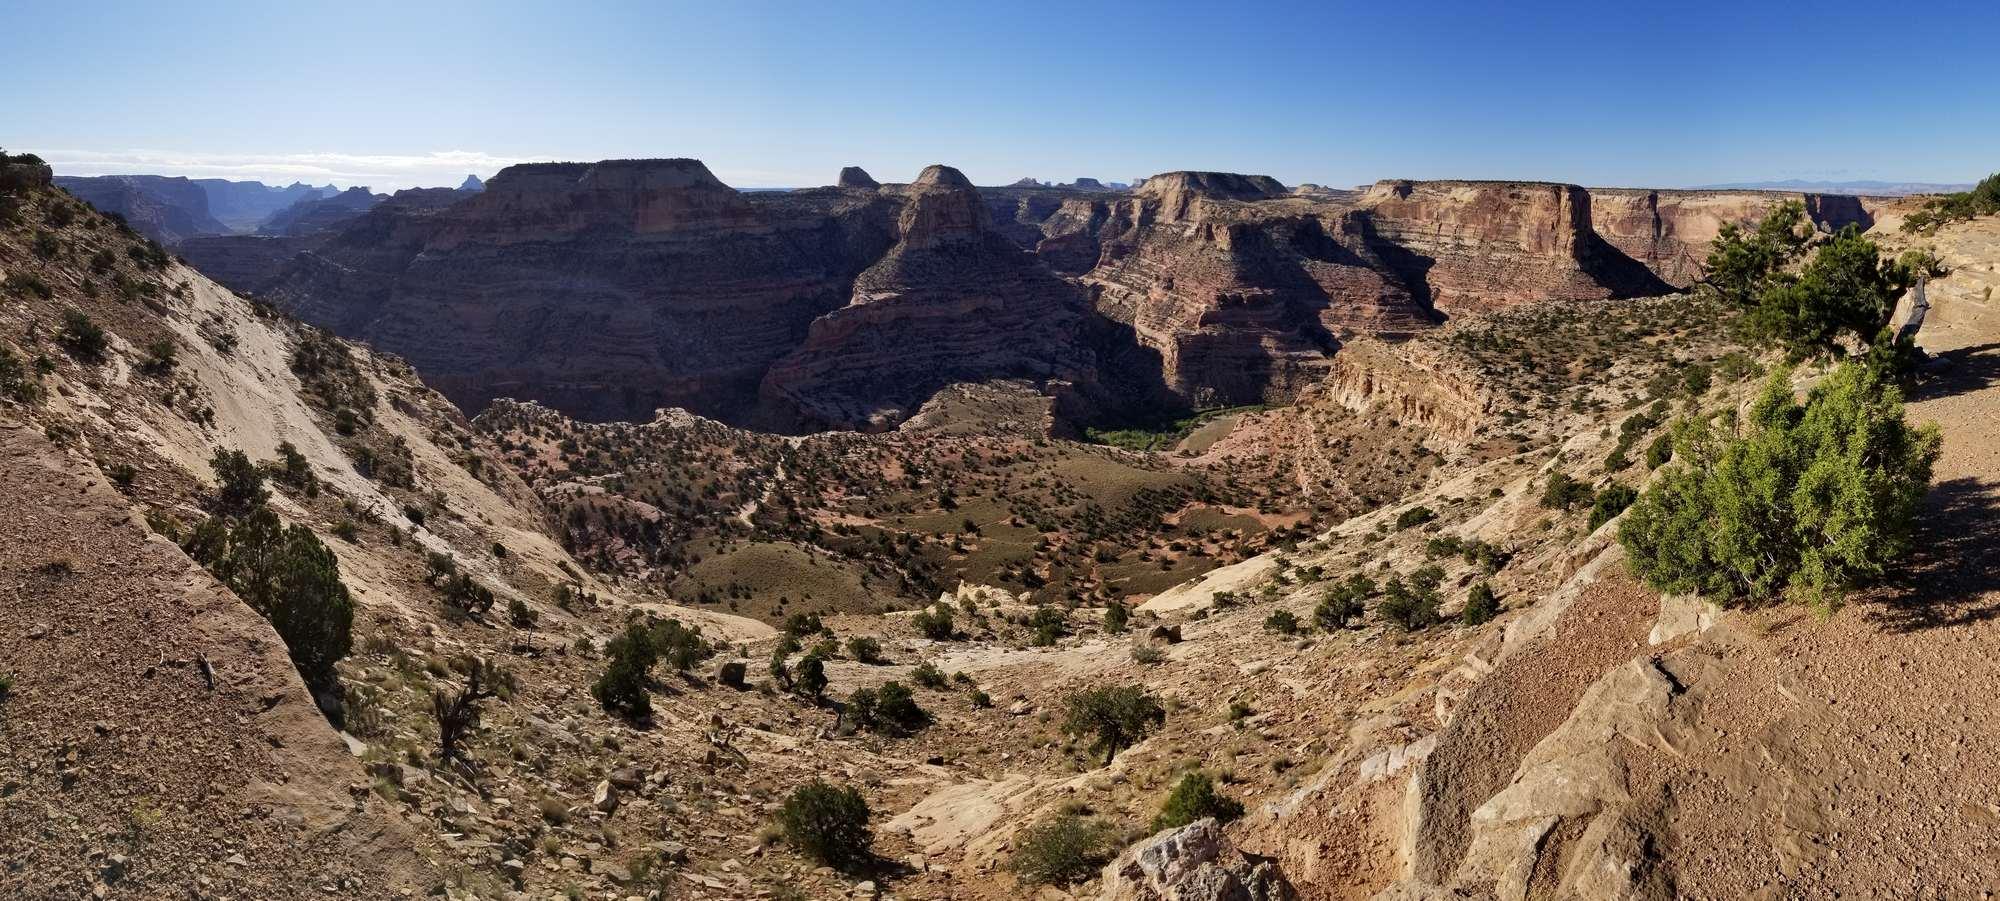 Utah's Little Grand Canyon - San Rafael Swell